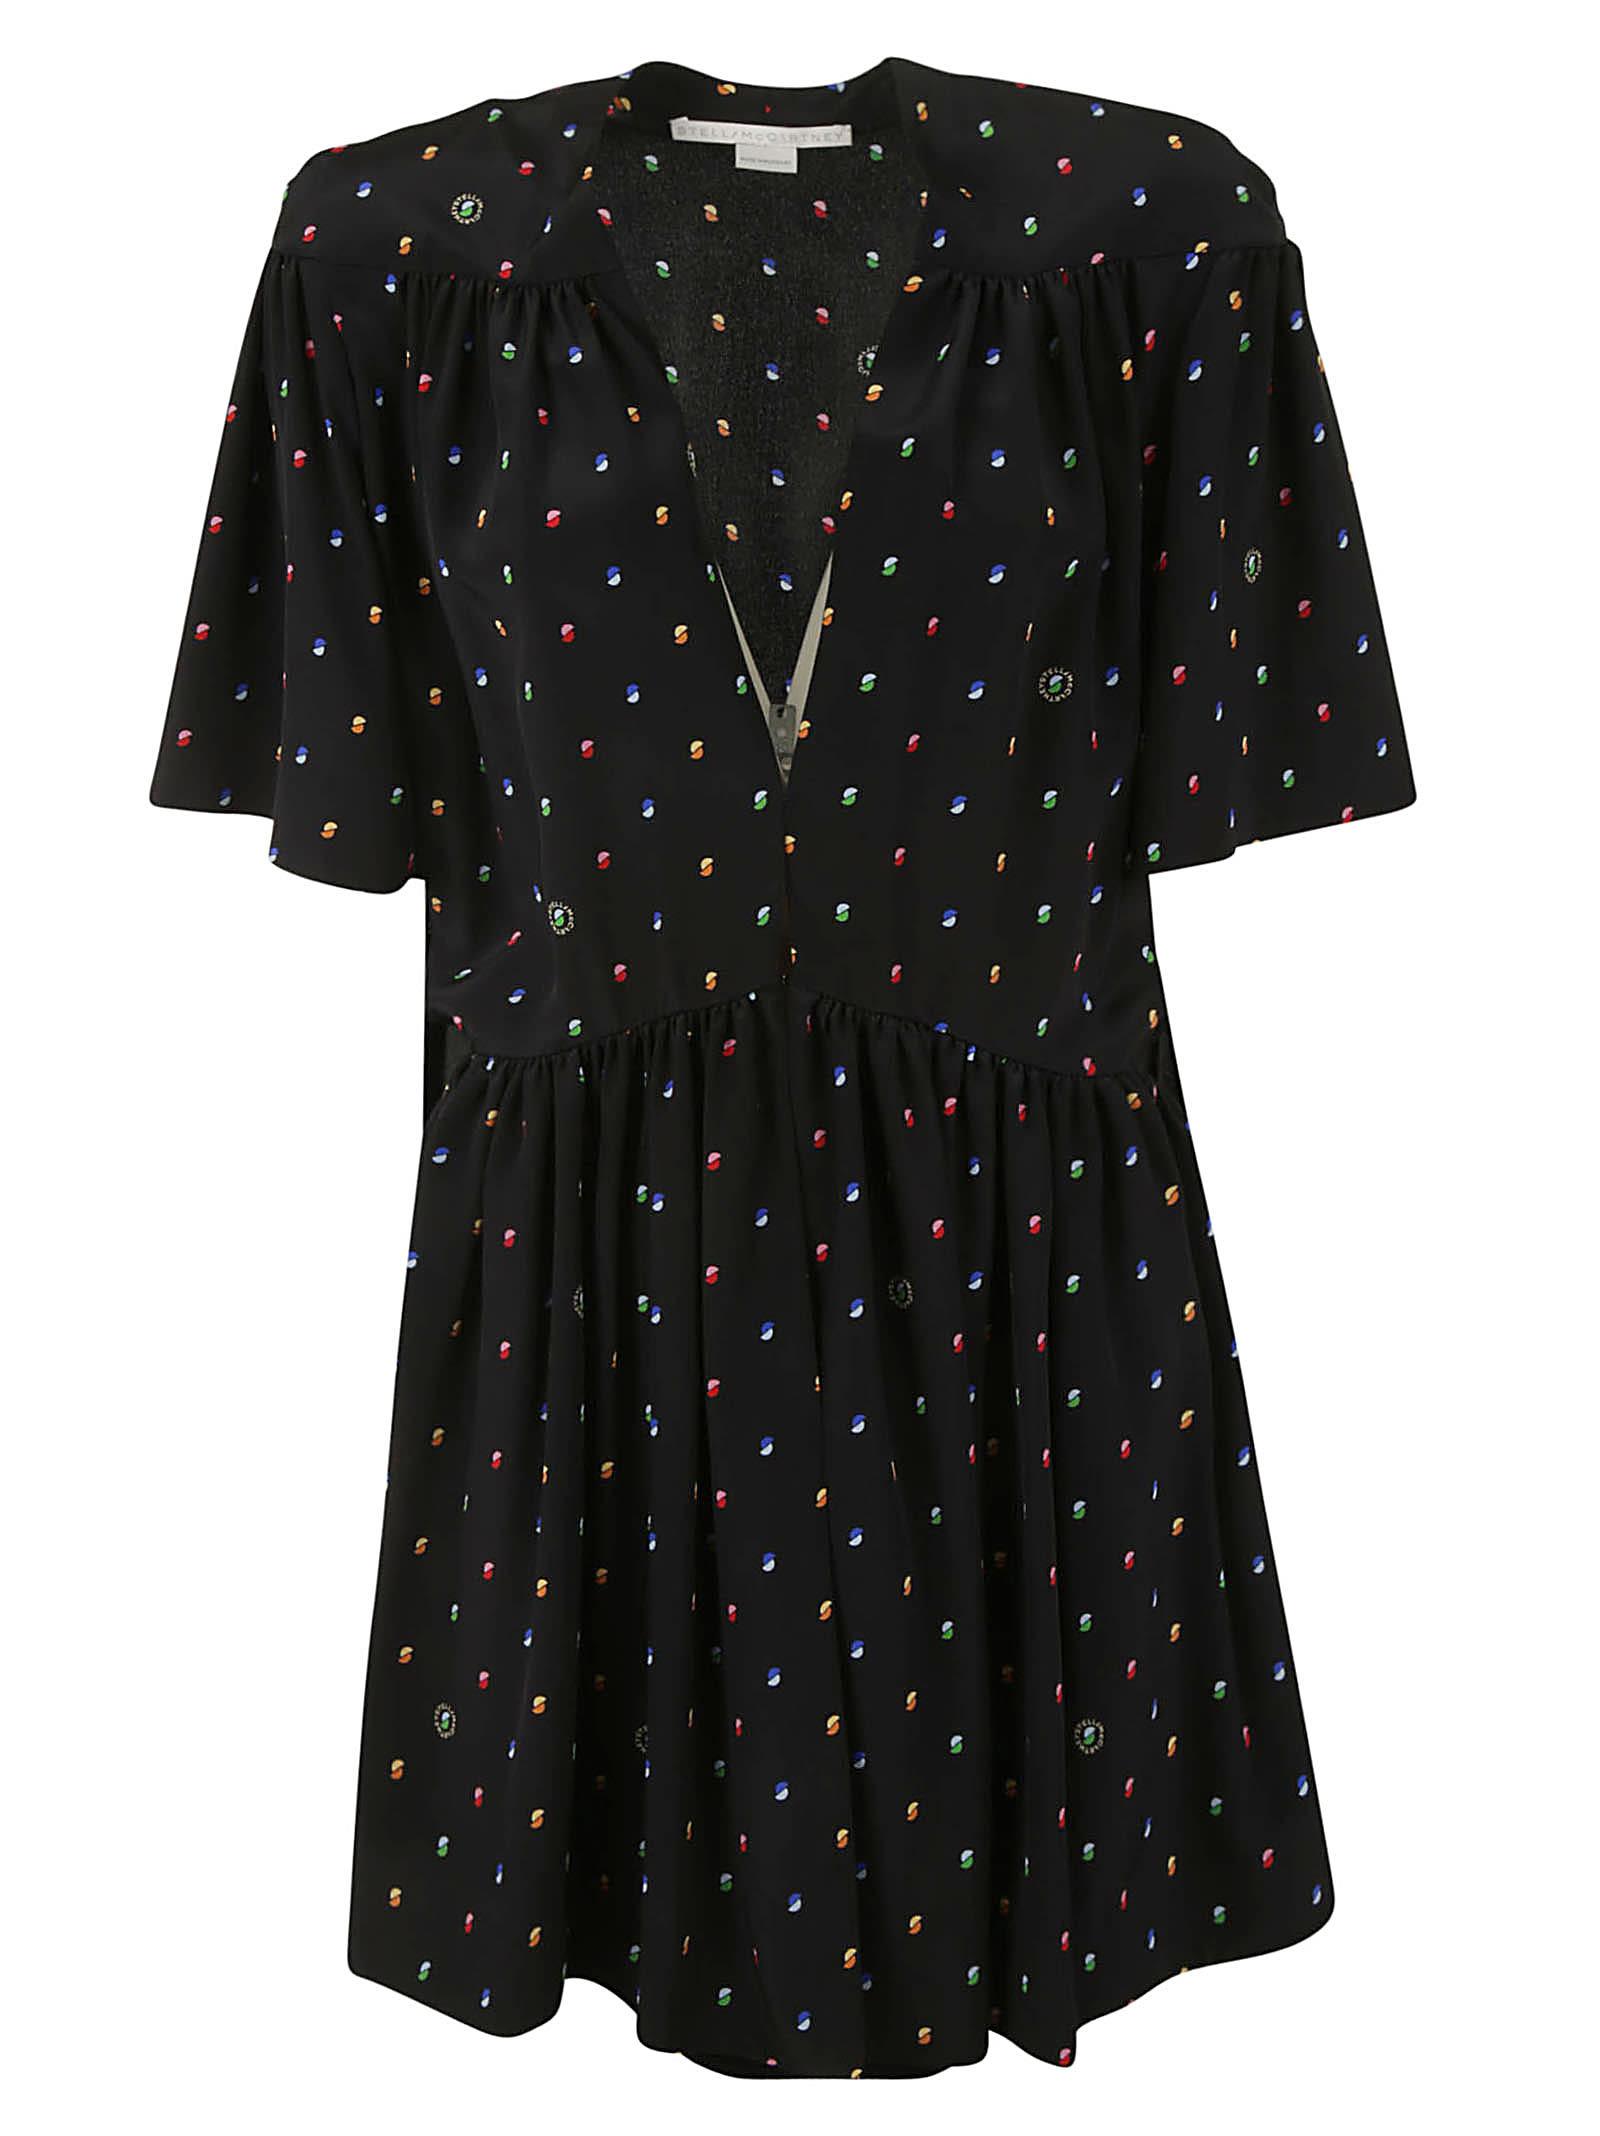 Stella McCartney Printed Short Dress